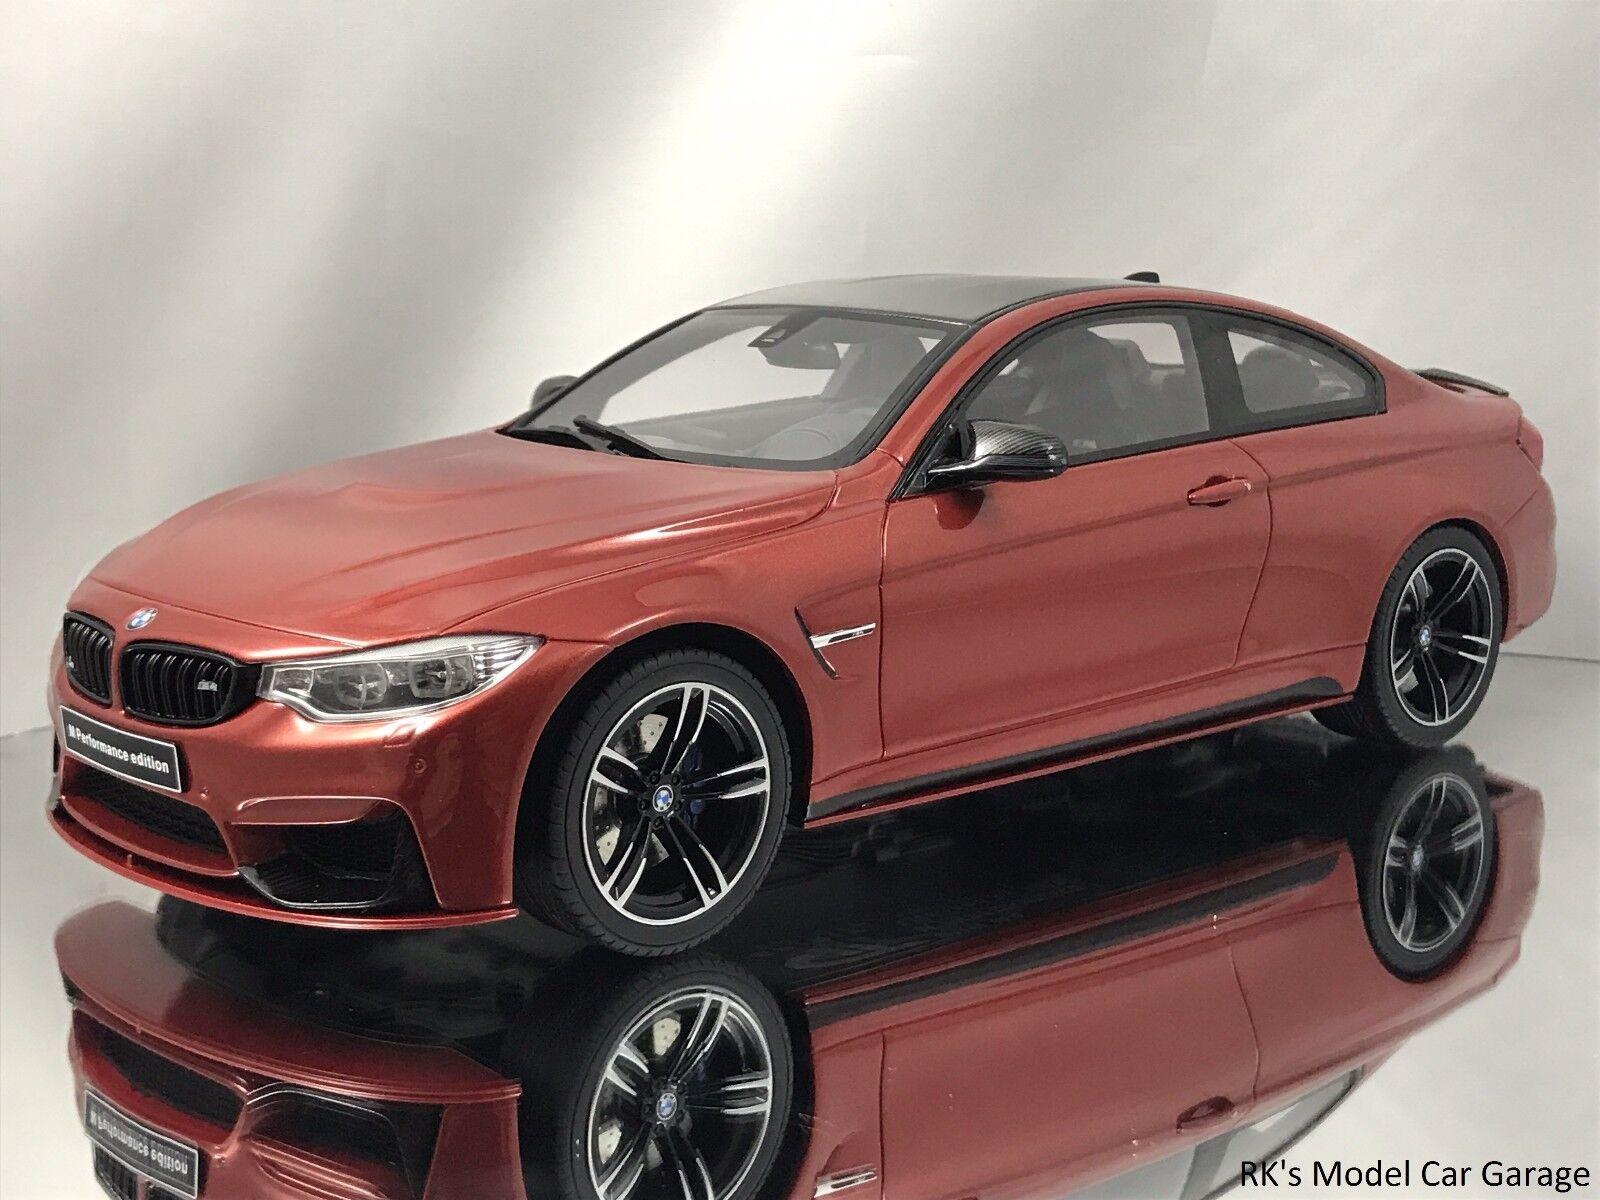 Centro comercial profesional integrado en línea. GT GT GT Spirit BMW M4 F82 Coupe M Rendimiento Metálico Naranja Resina Modelo de Auto 1 18  suministro de productos de calidad